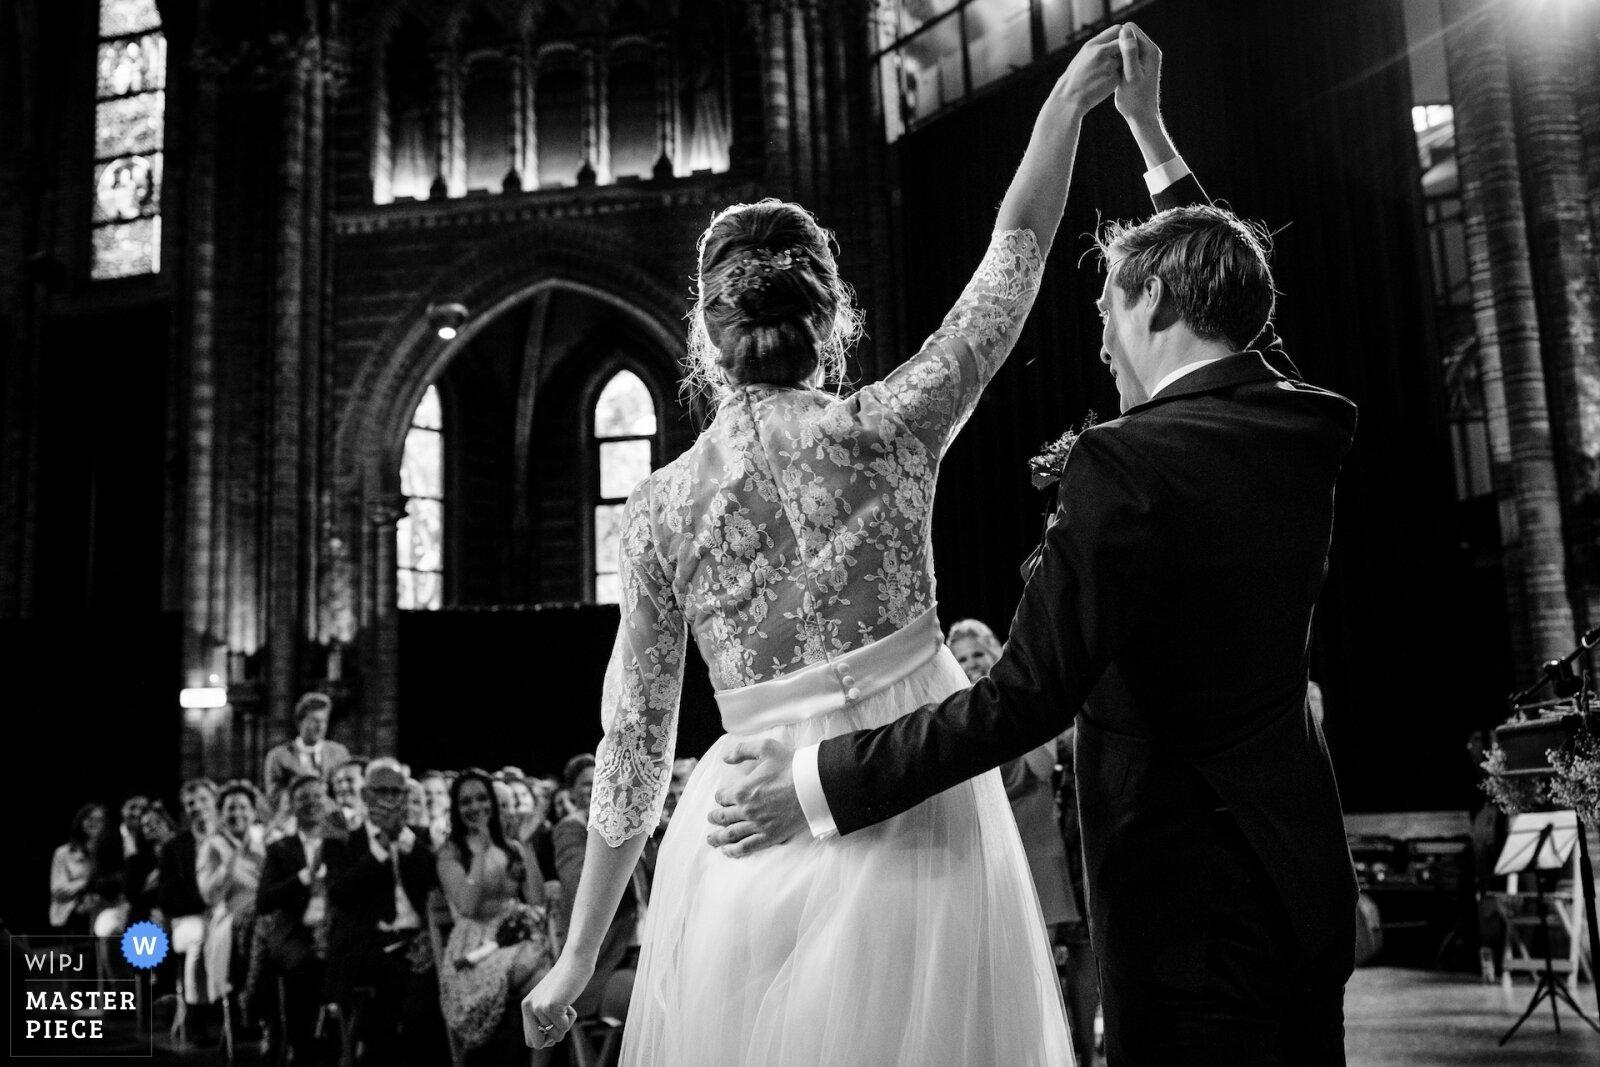 Wedding photo journalists association v10 2019